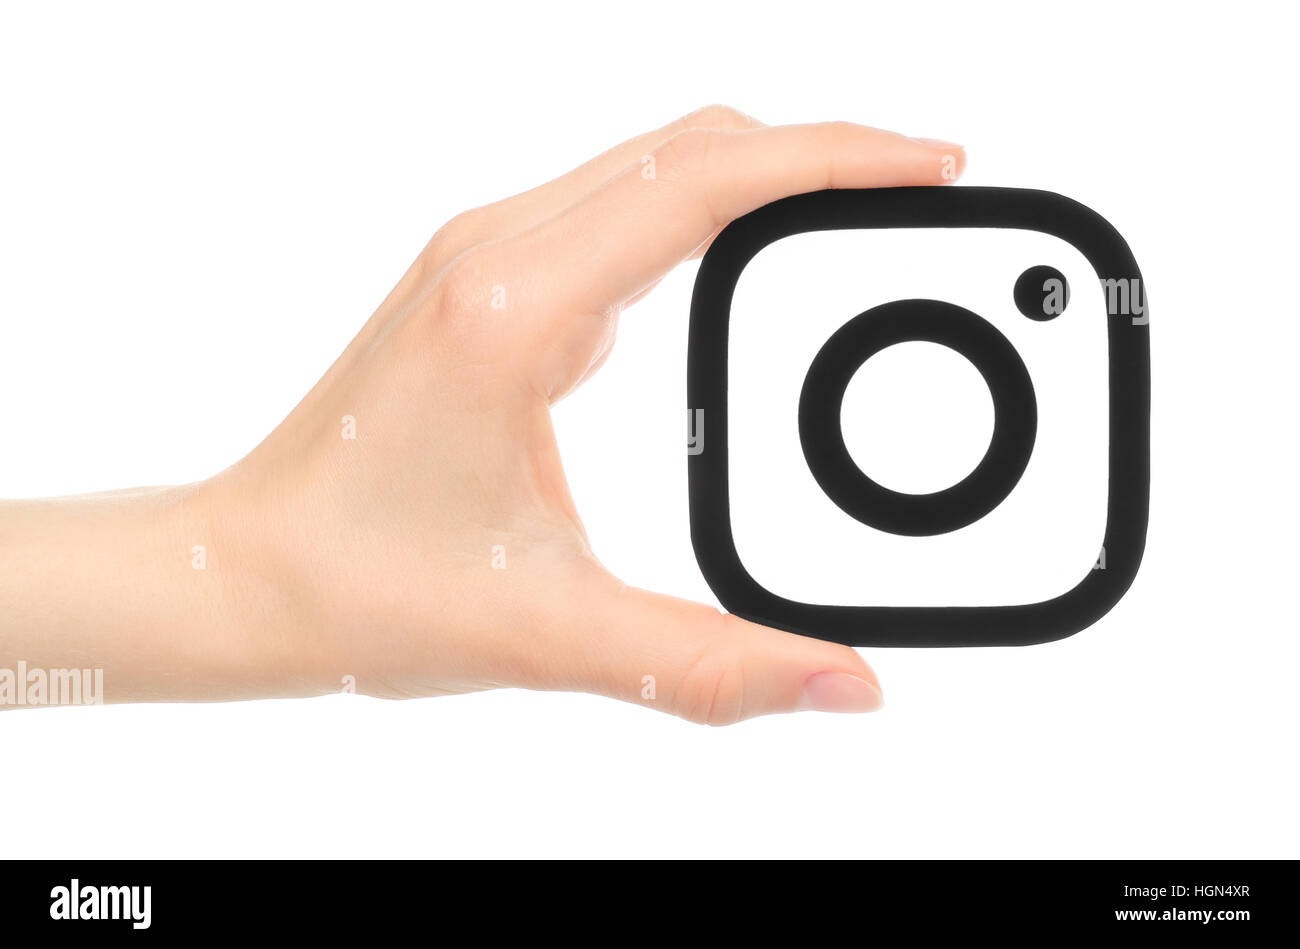 Kiev Ucraina 17 Maggio 2016 Mano Trattiene Nuovo Instagram Logo